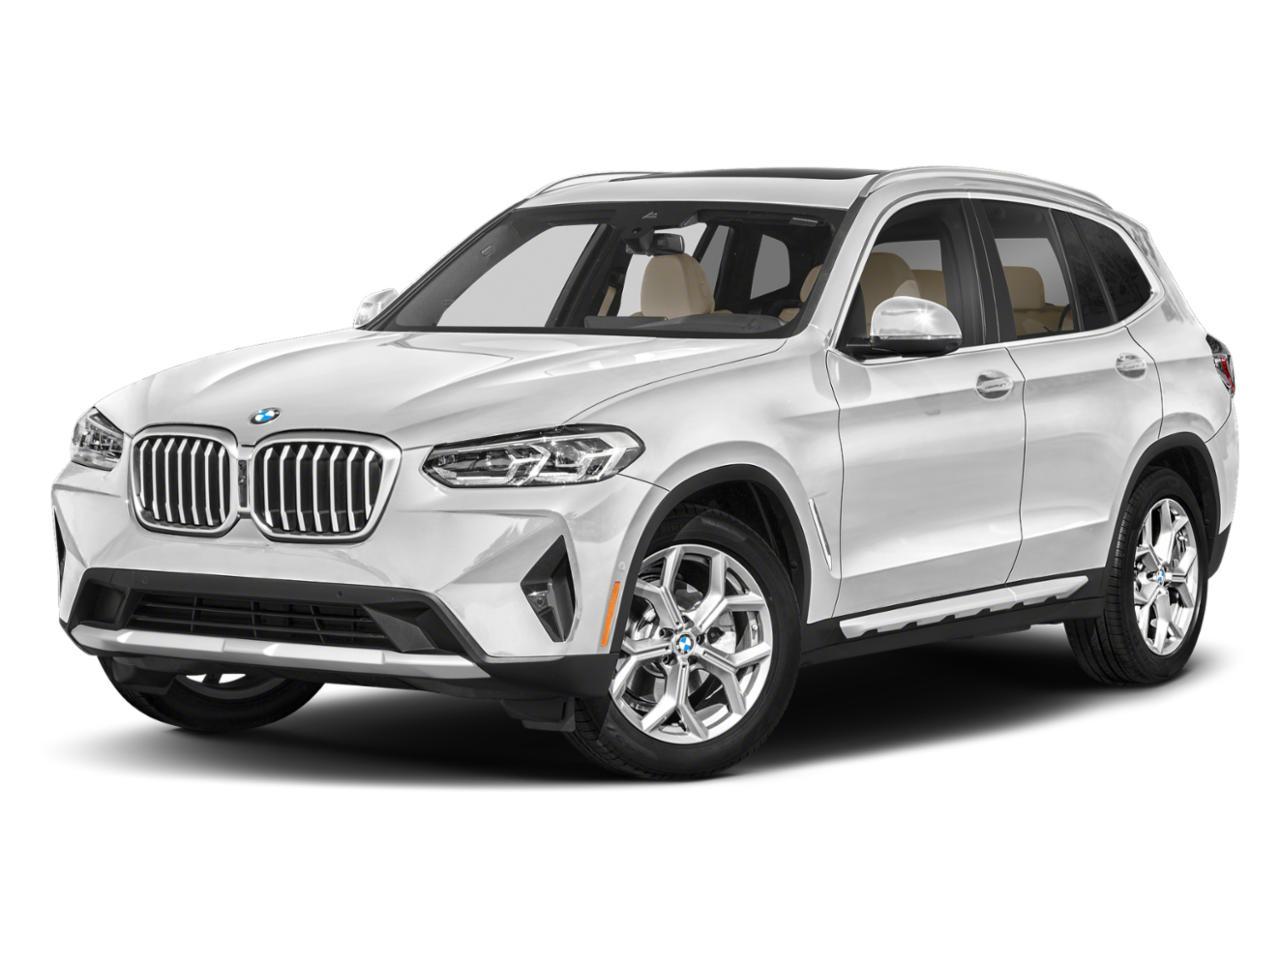 2022 BMW X3 xDrive30i Vehicle Photo in PLANO, TX 75024-3599